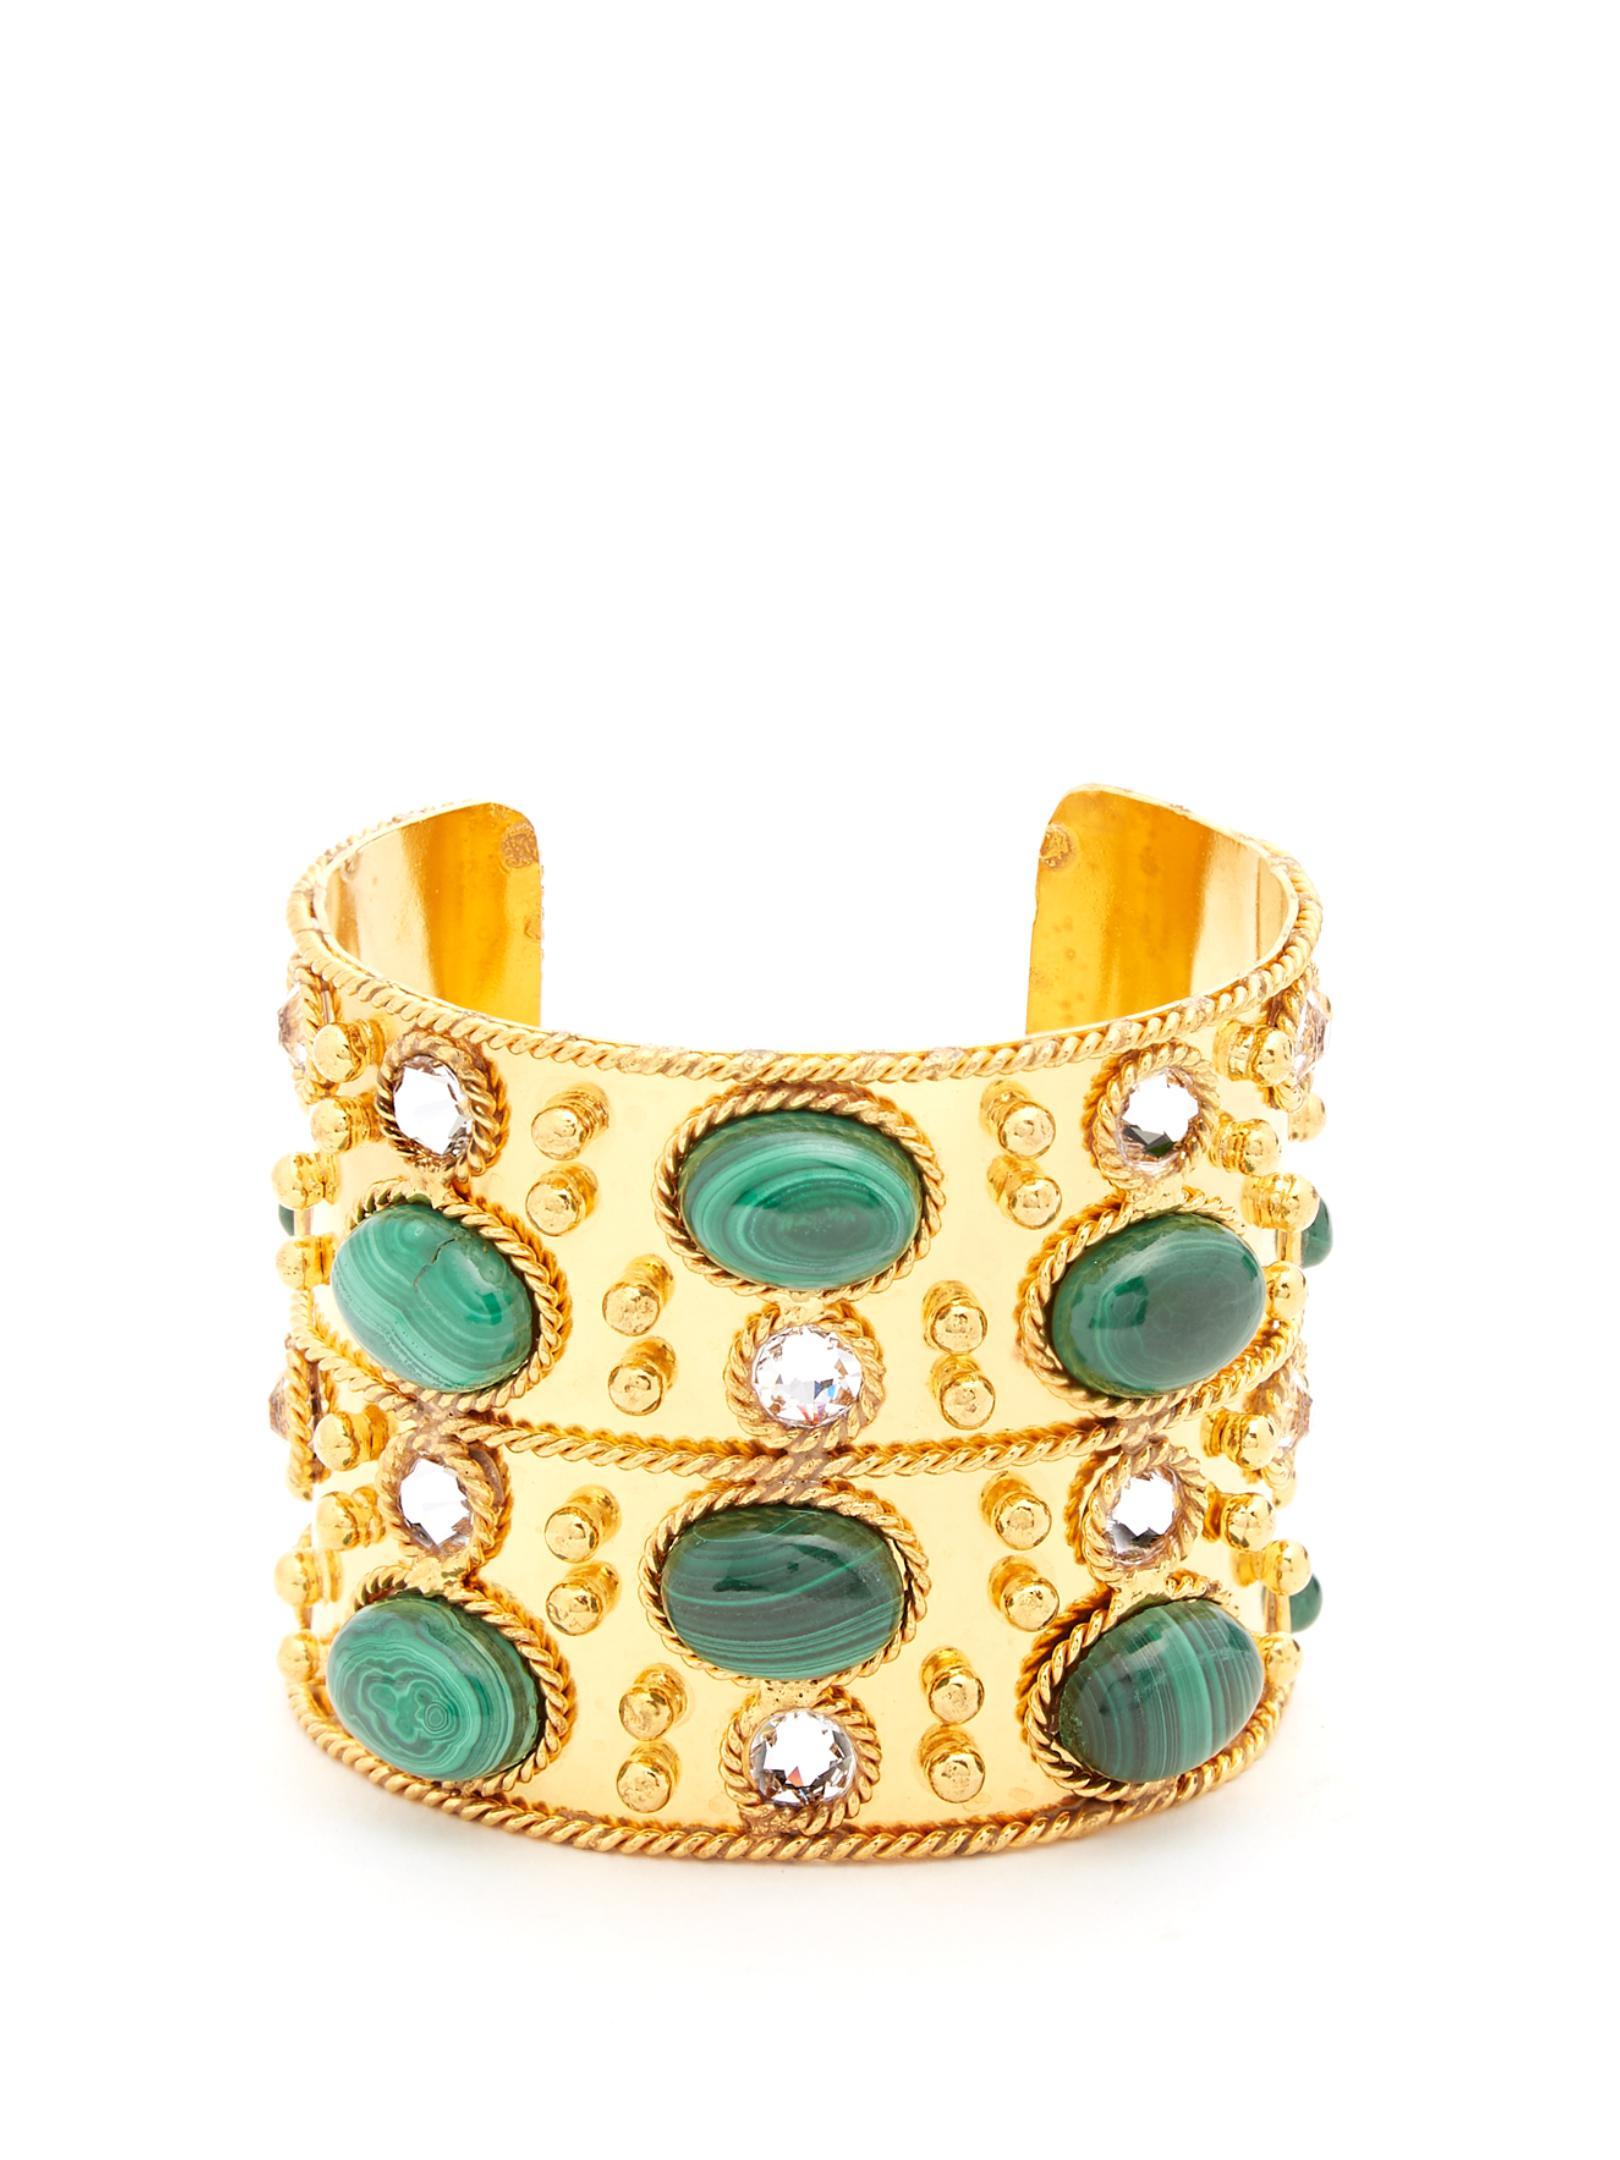 Sylvia Toledano Byzance Cuff Bracelet in Gold-Plated Brass idAHH